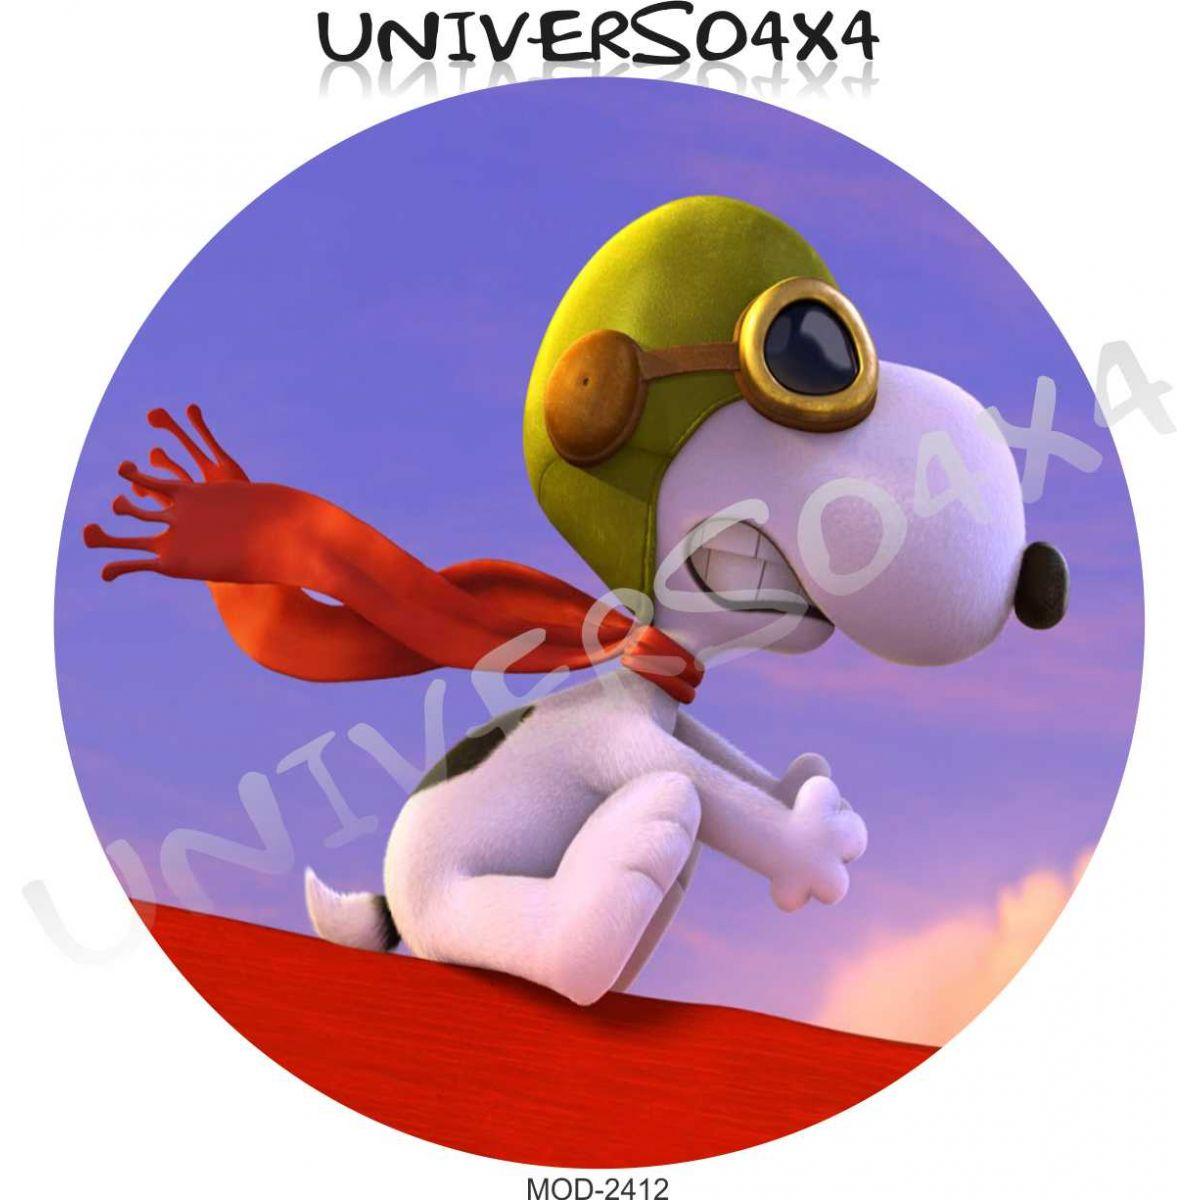 Capa Estepe Snoopy M-2412